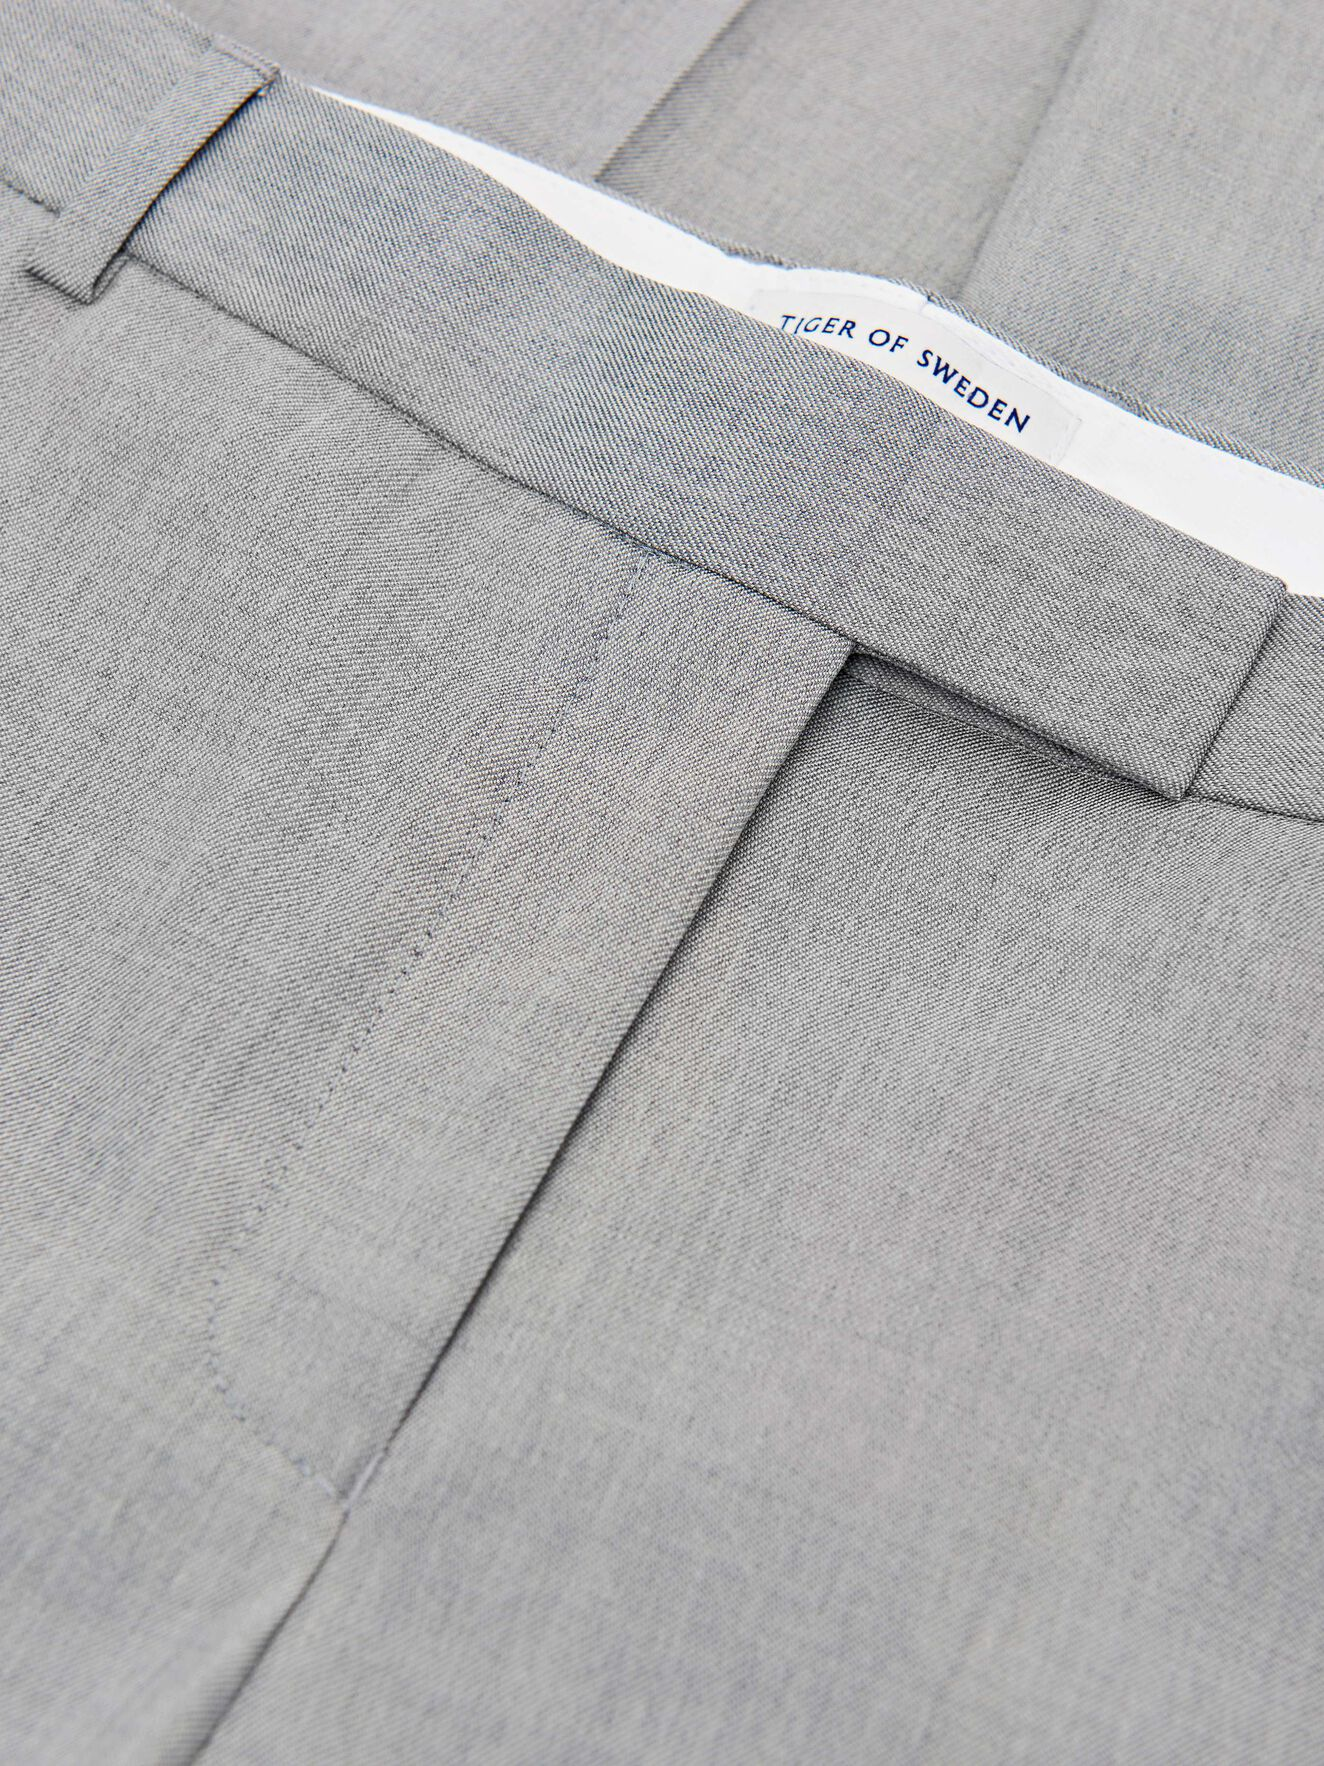 Hollen Trousers in Light grey melange from Tiger of Sweden